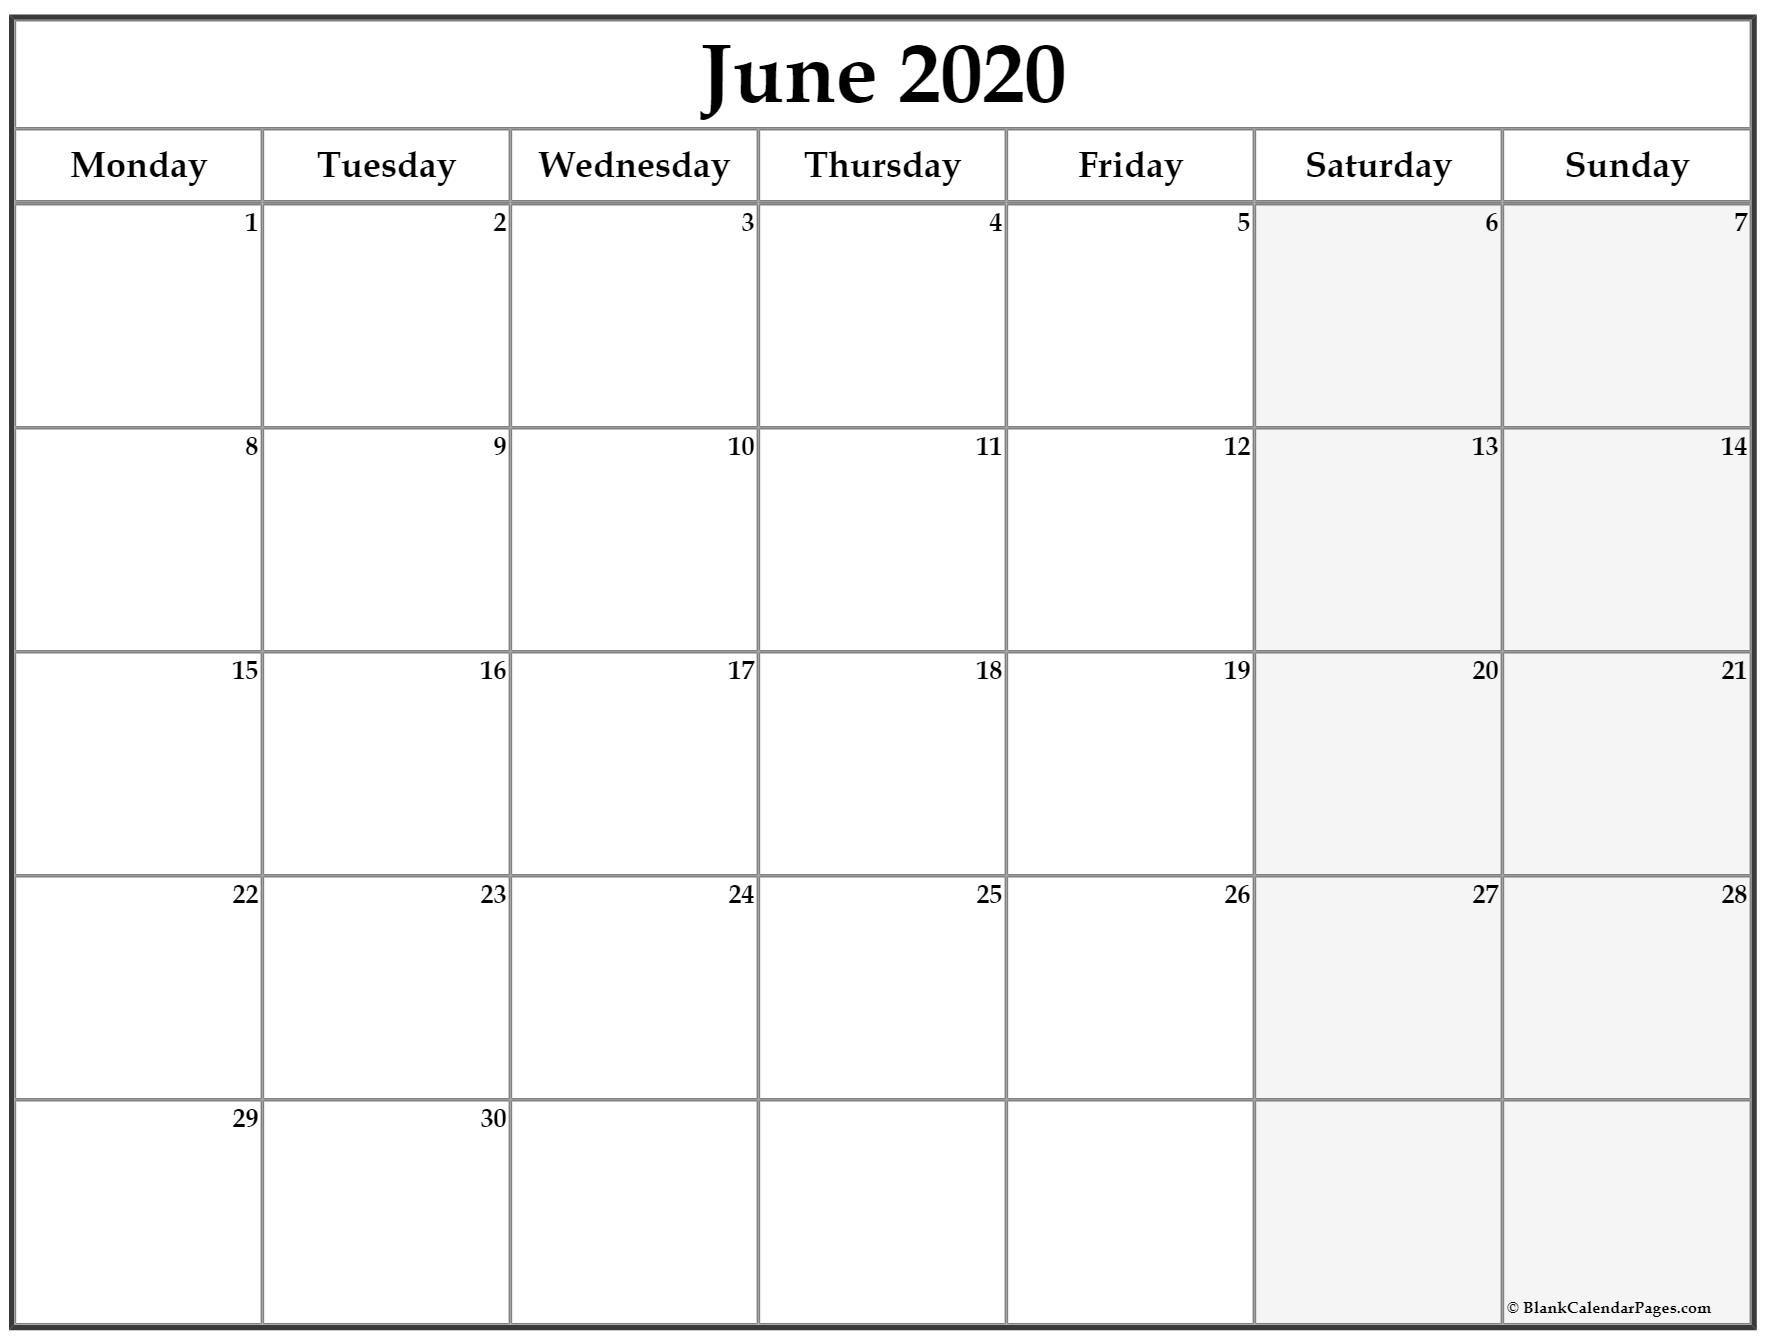 June 2020 Monday Calendar | Monday To Sunday